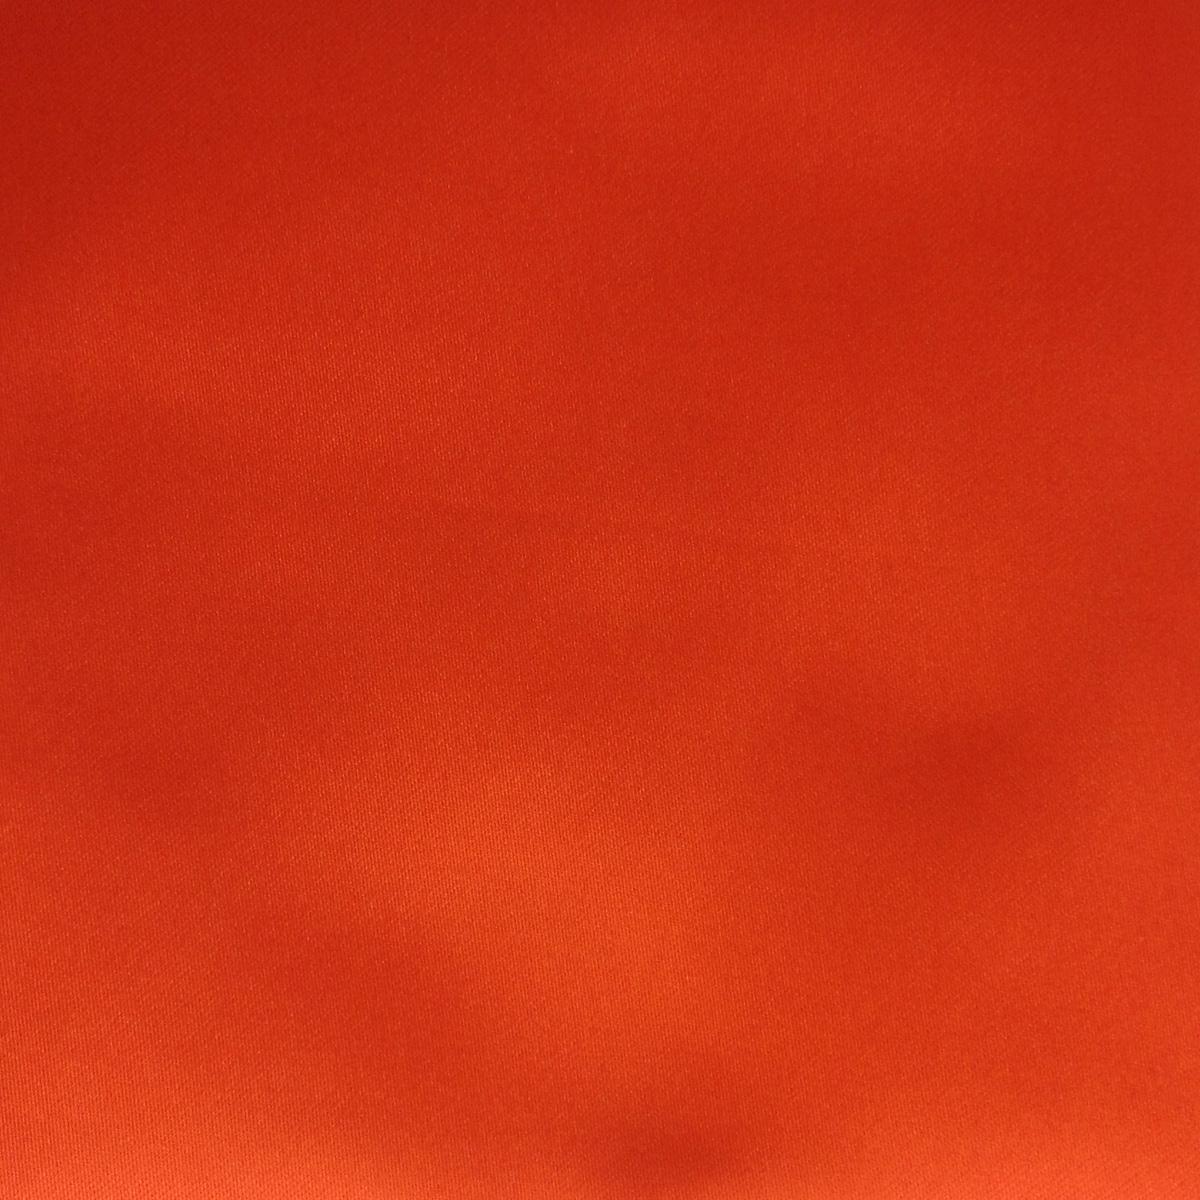 B1764 17 orange mens ties facemasks con murphys menswear cork - - Con Murphys Menswear